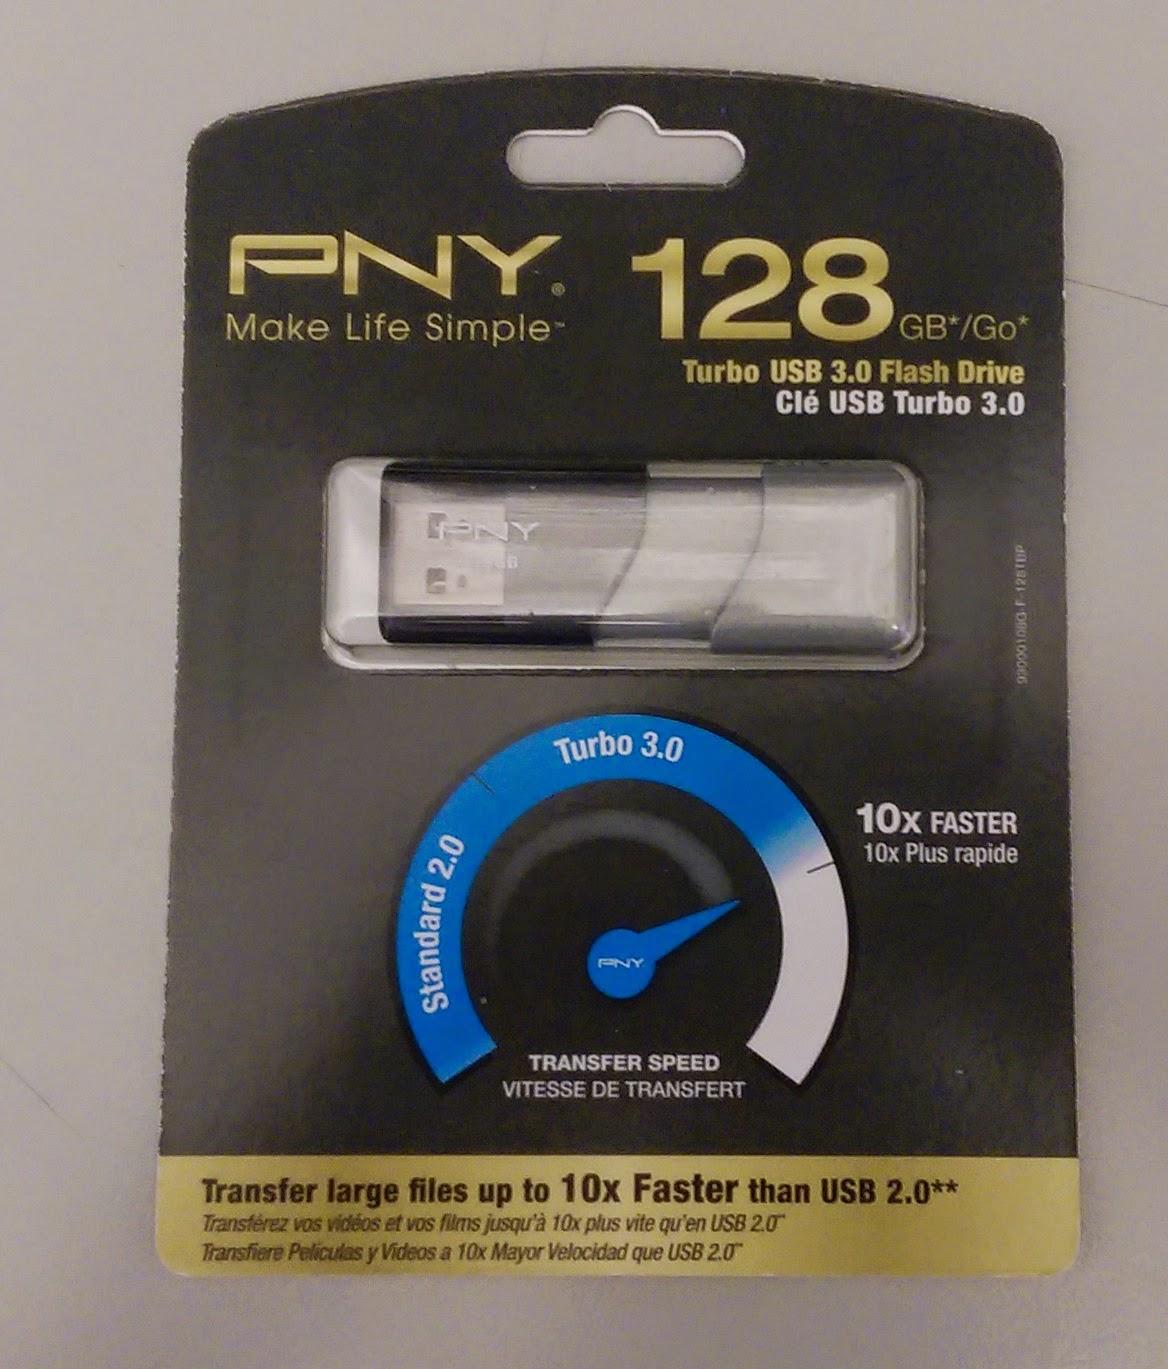 Fortysomething Geek 128gb Usb Stick Yep Pny 128gb Usb 3 0 Flash